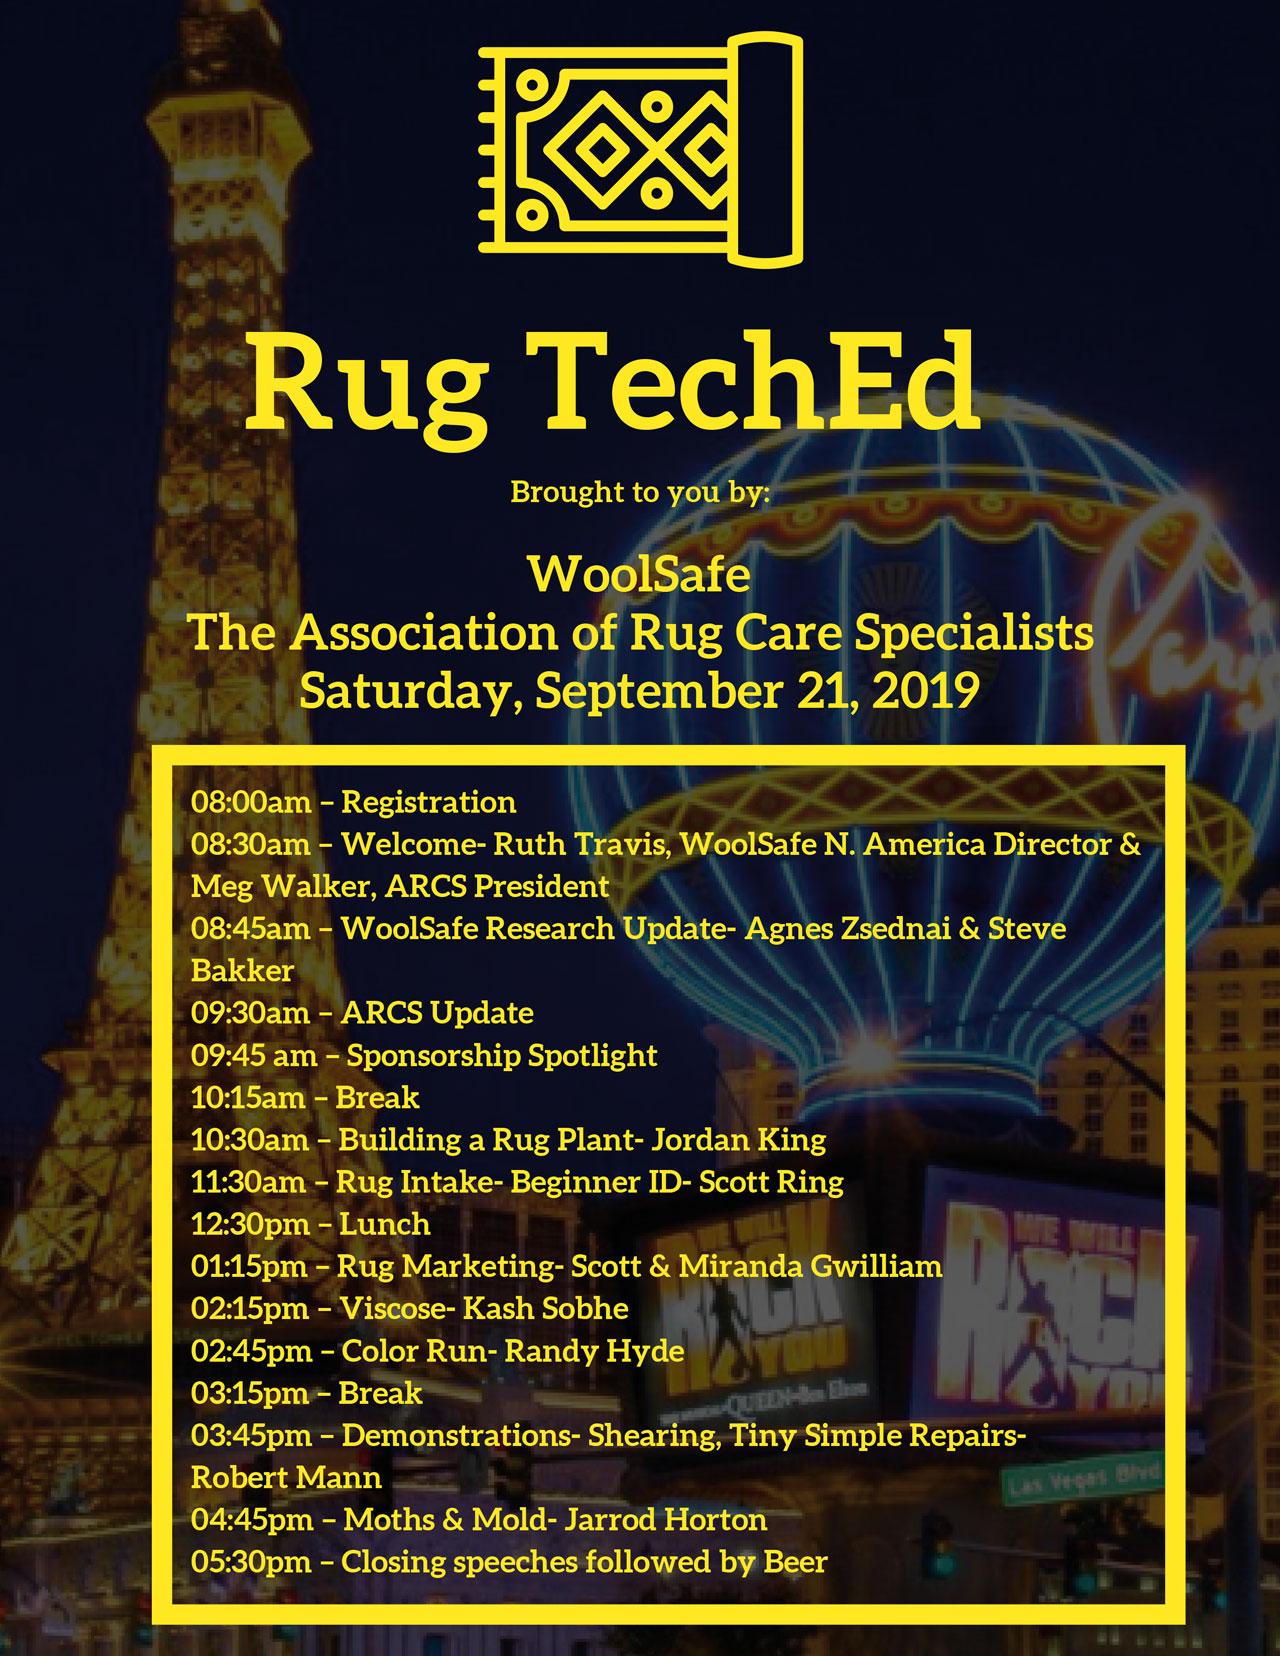 Rug-TechEd-Schedule2.jpg